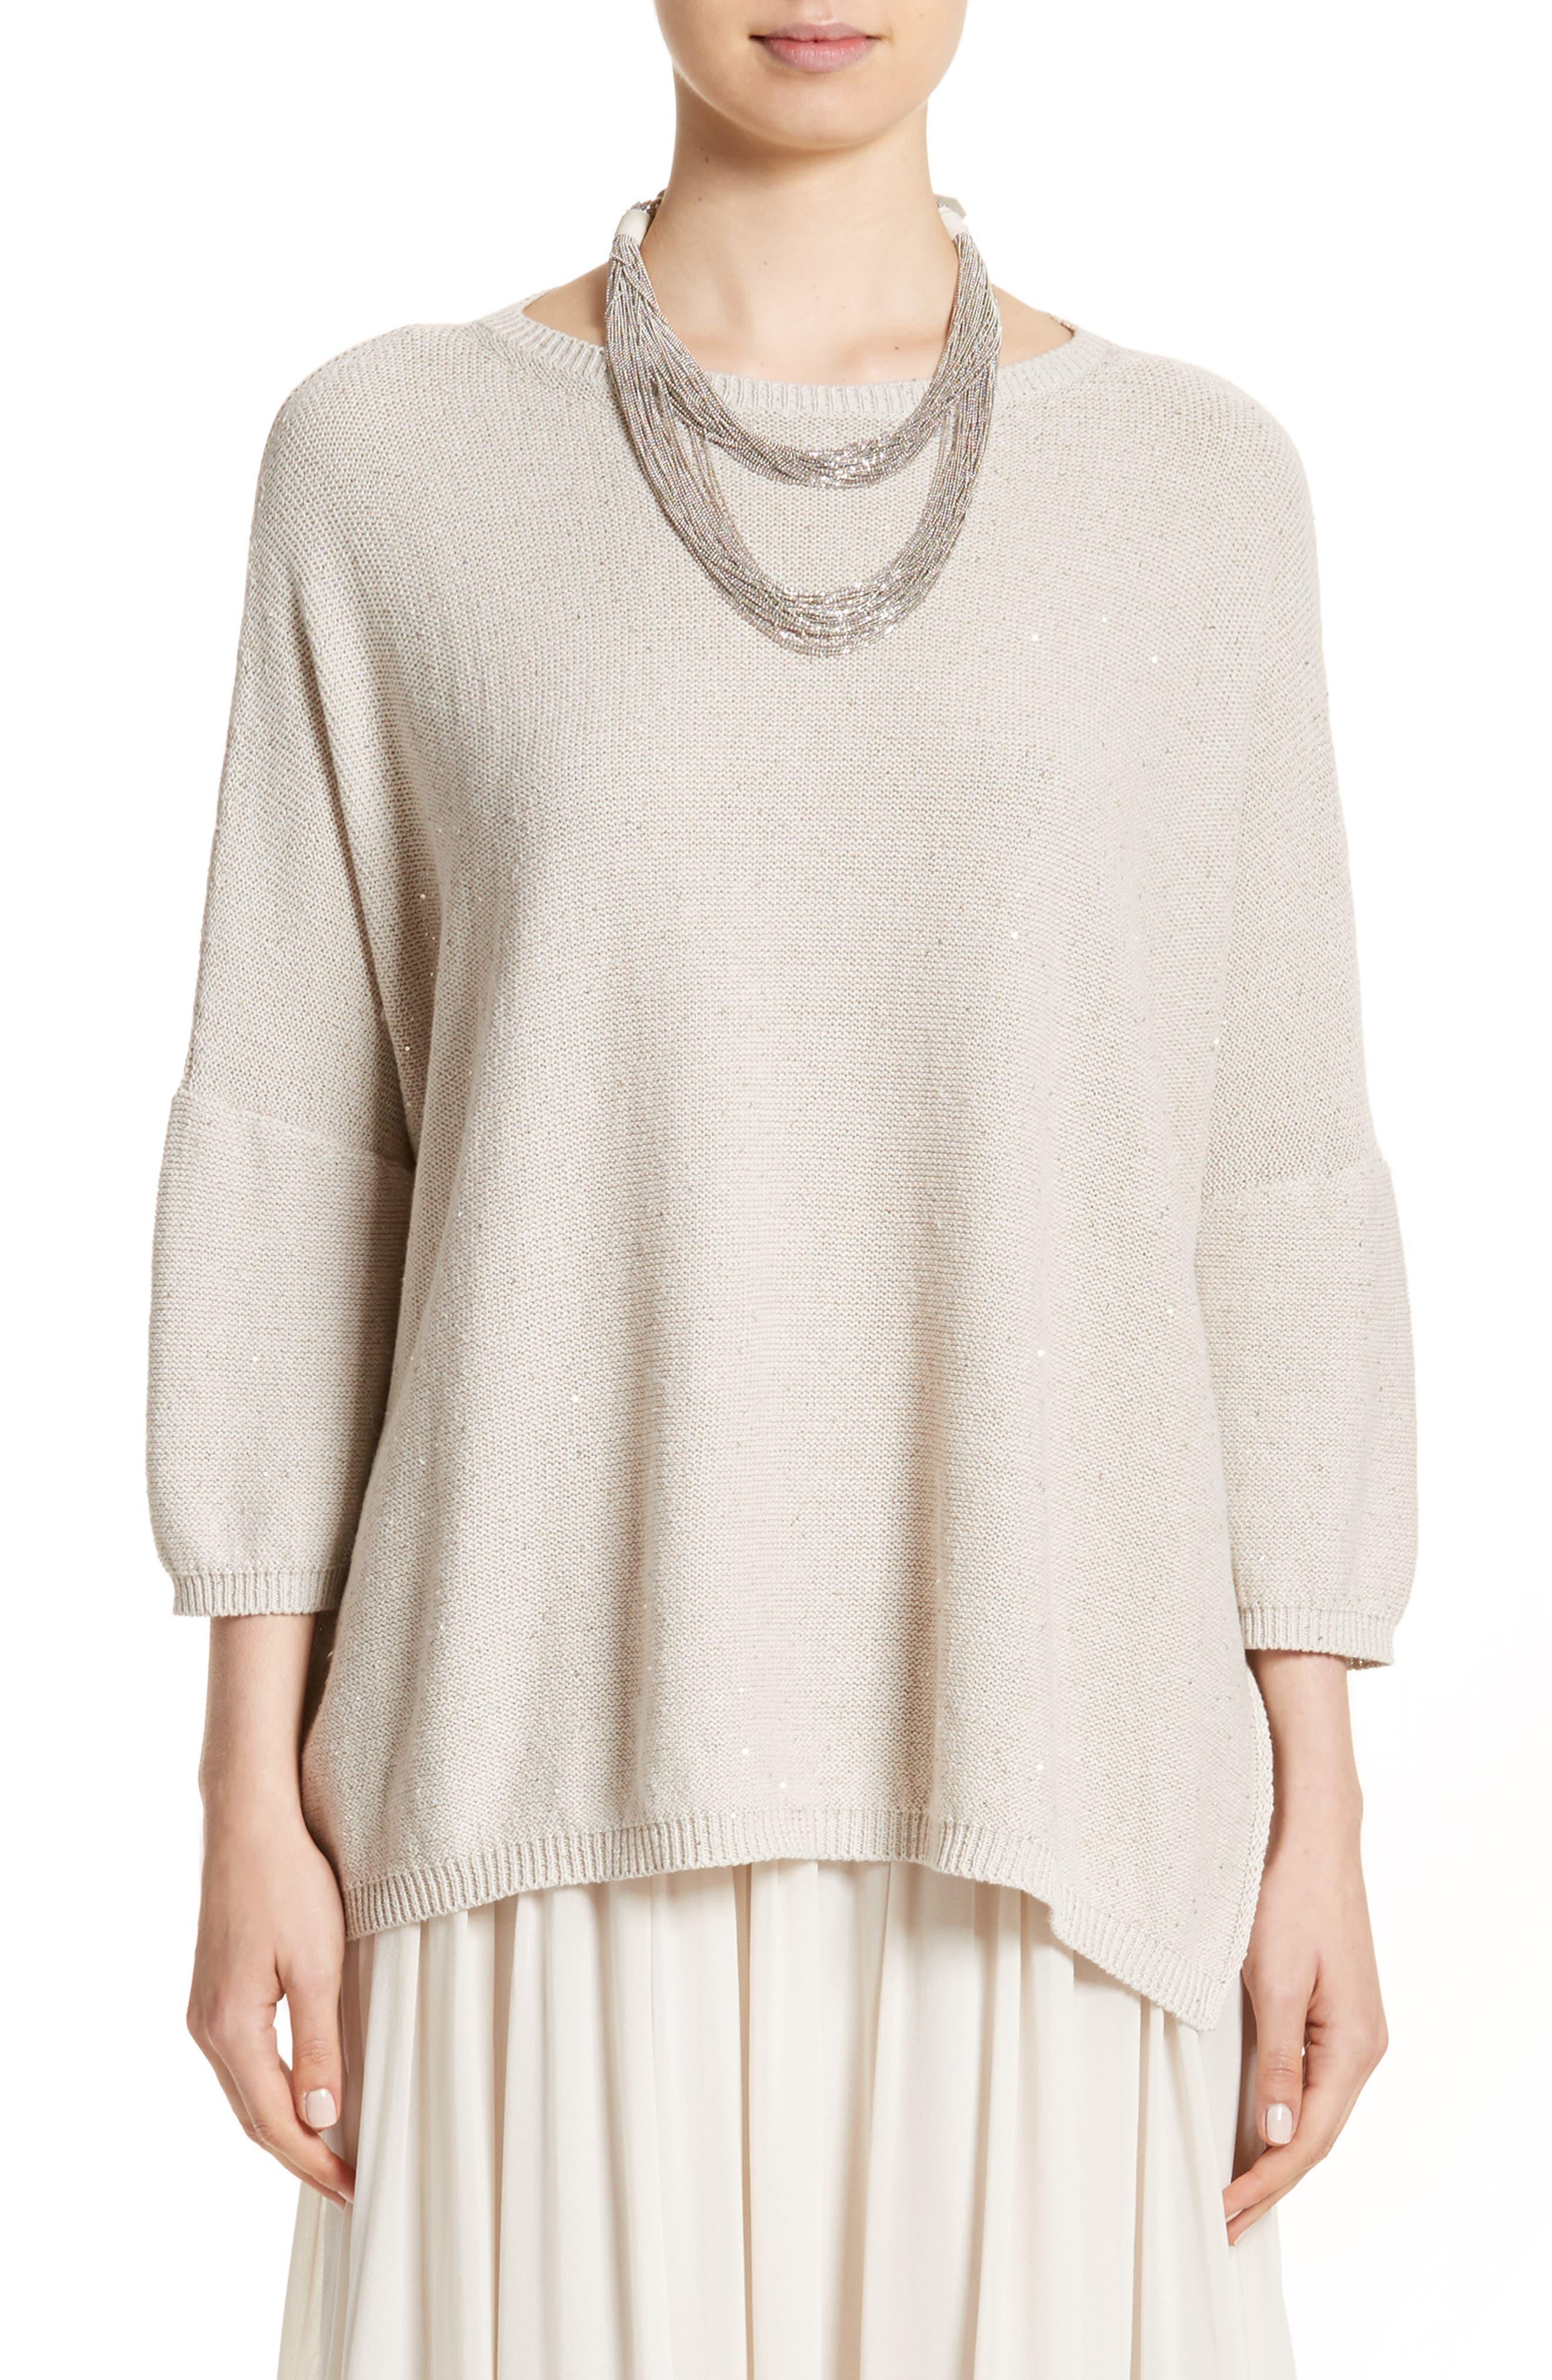 Fabiana Filippi Sequin Knit Dolman Sweater